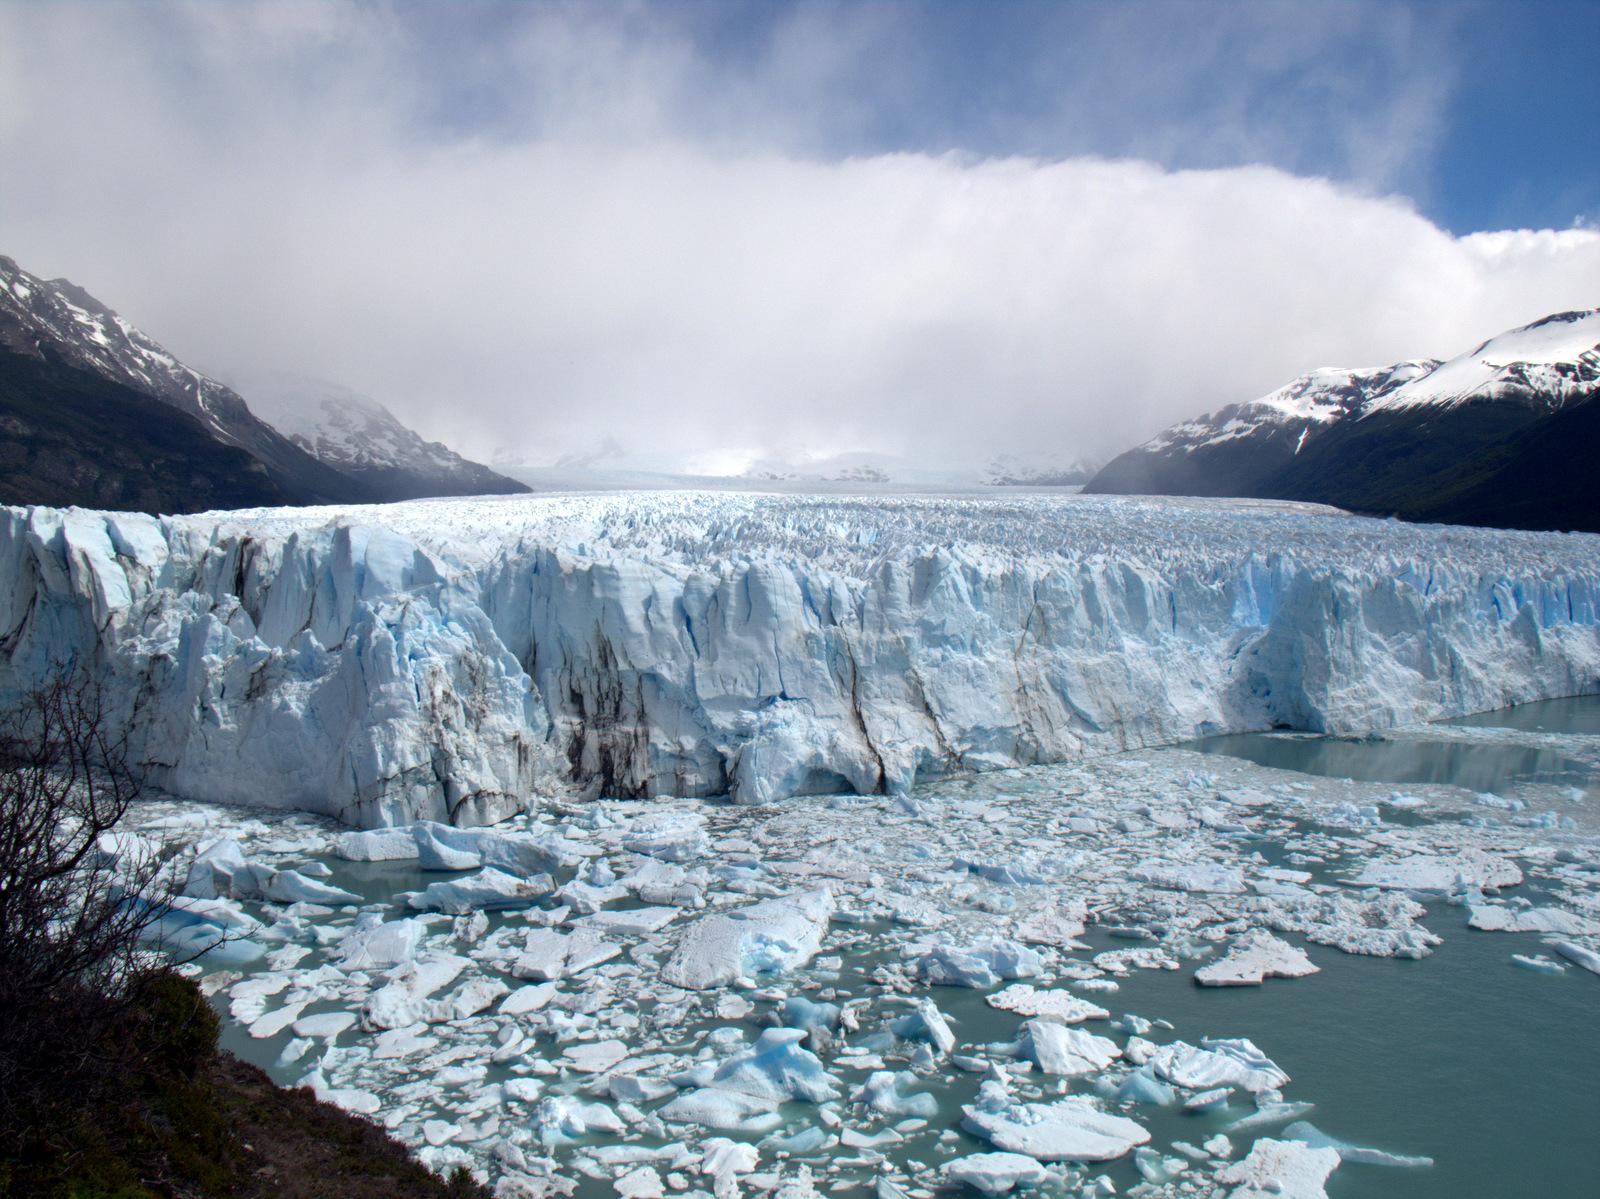 Blick auf den Perito-Moreno Gletscher in Patagonien - November 2012